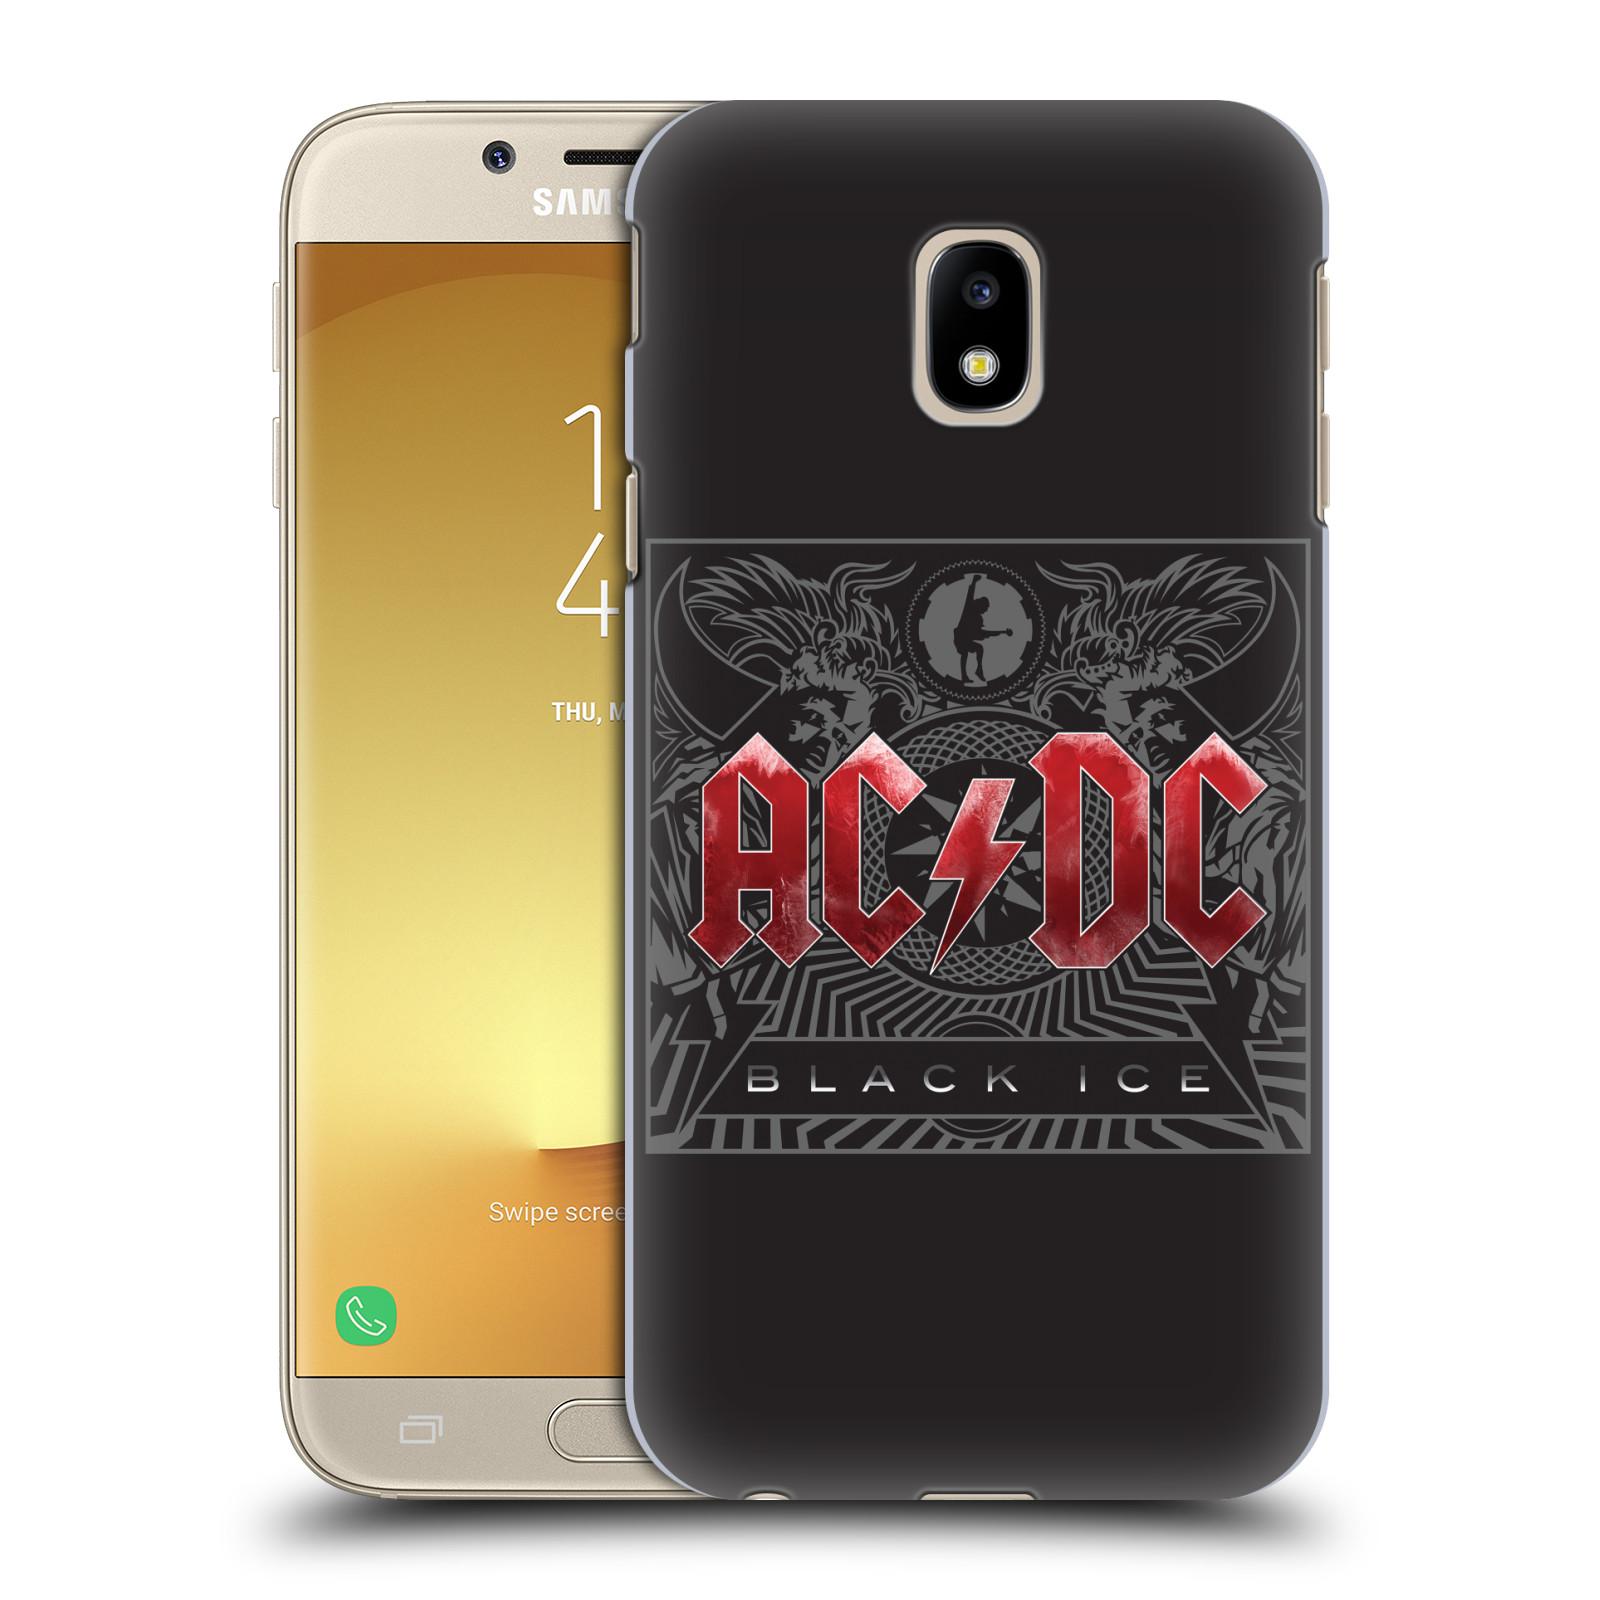 Plastové pouzdro na mobil Samsung Galaxy J3 (2017) - Head Case - AC/DC Black Ice